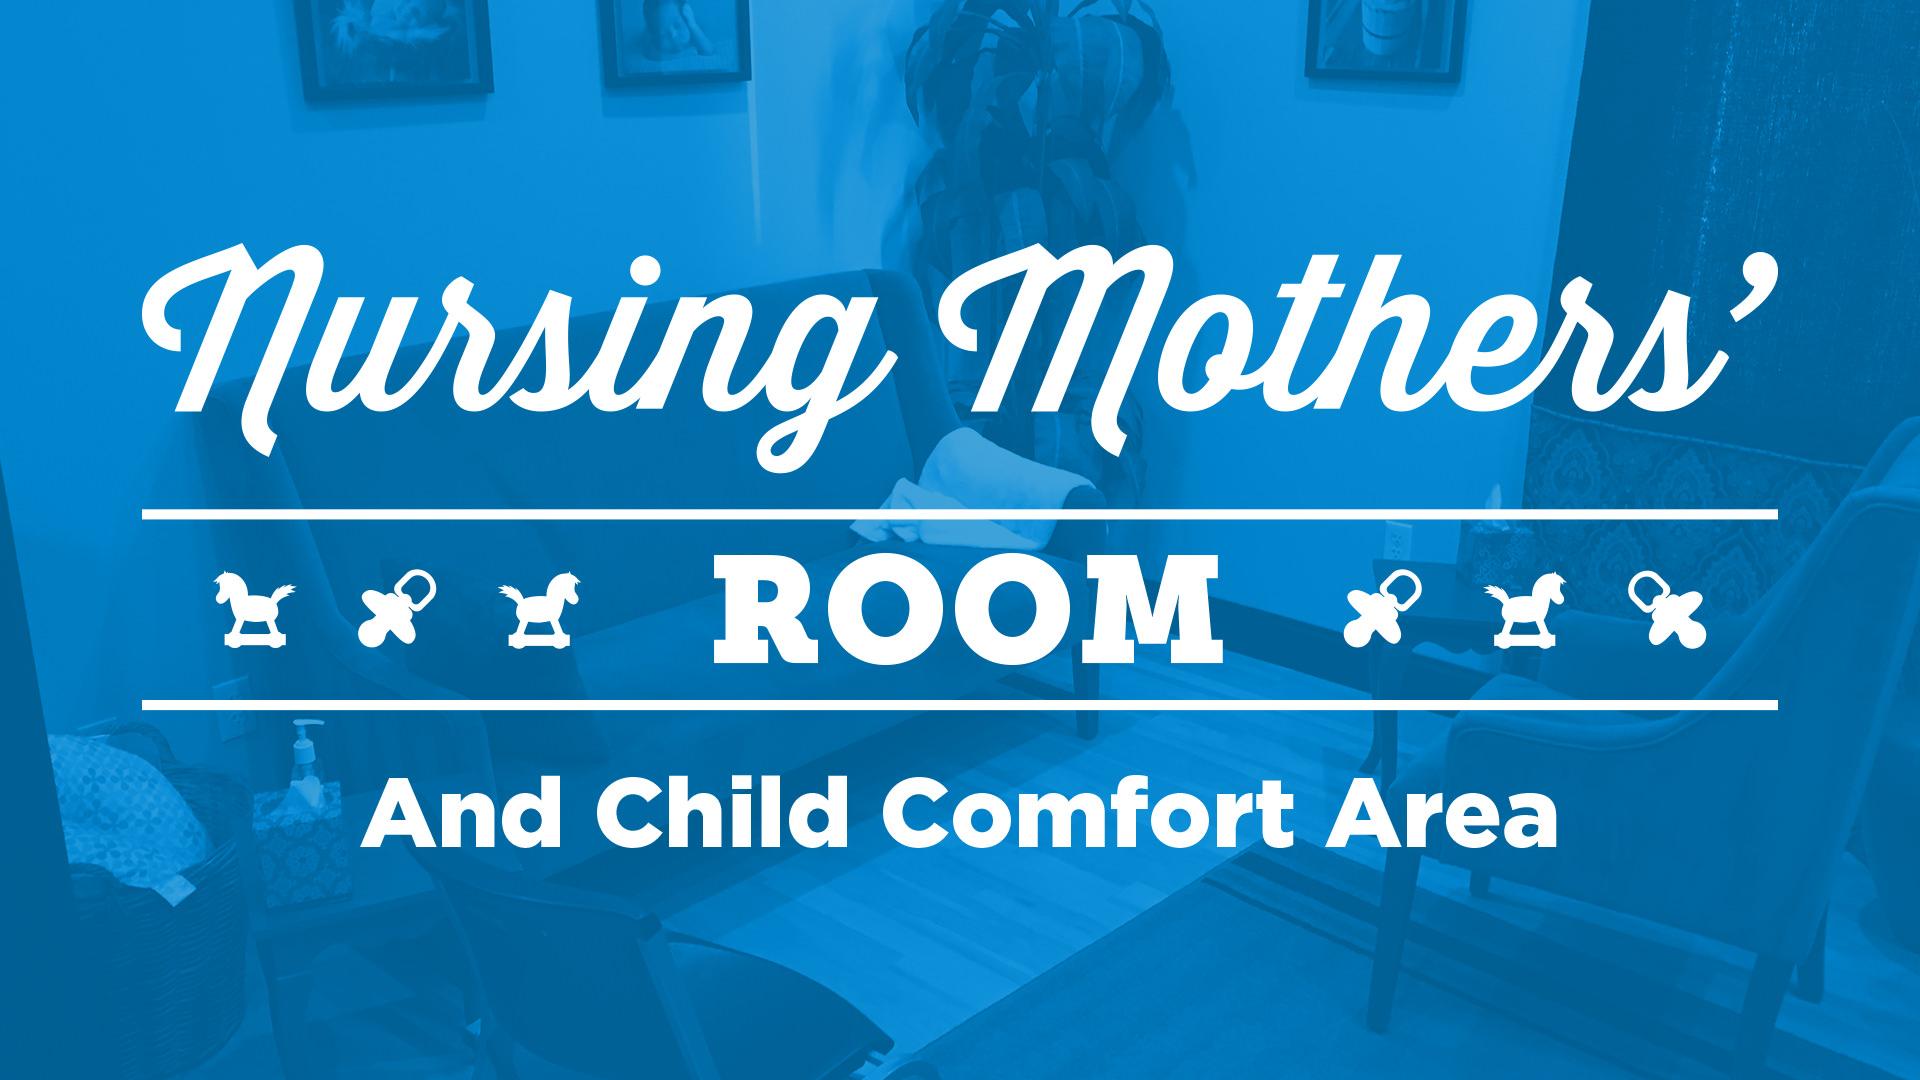 Nursing Mothers Room.jpg